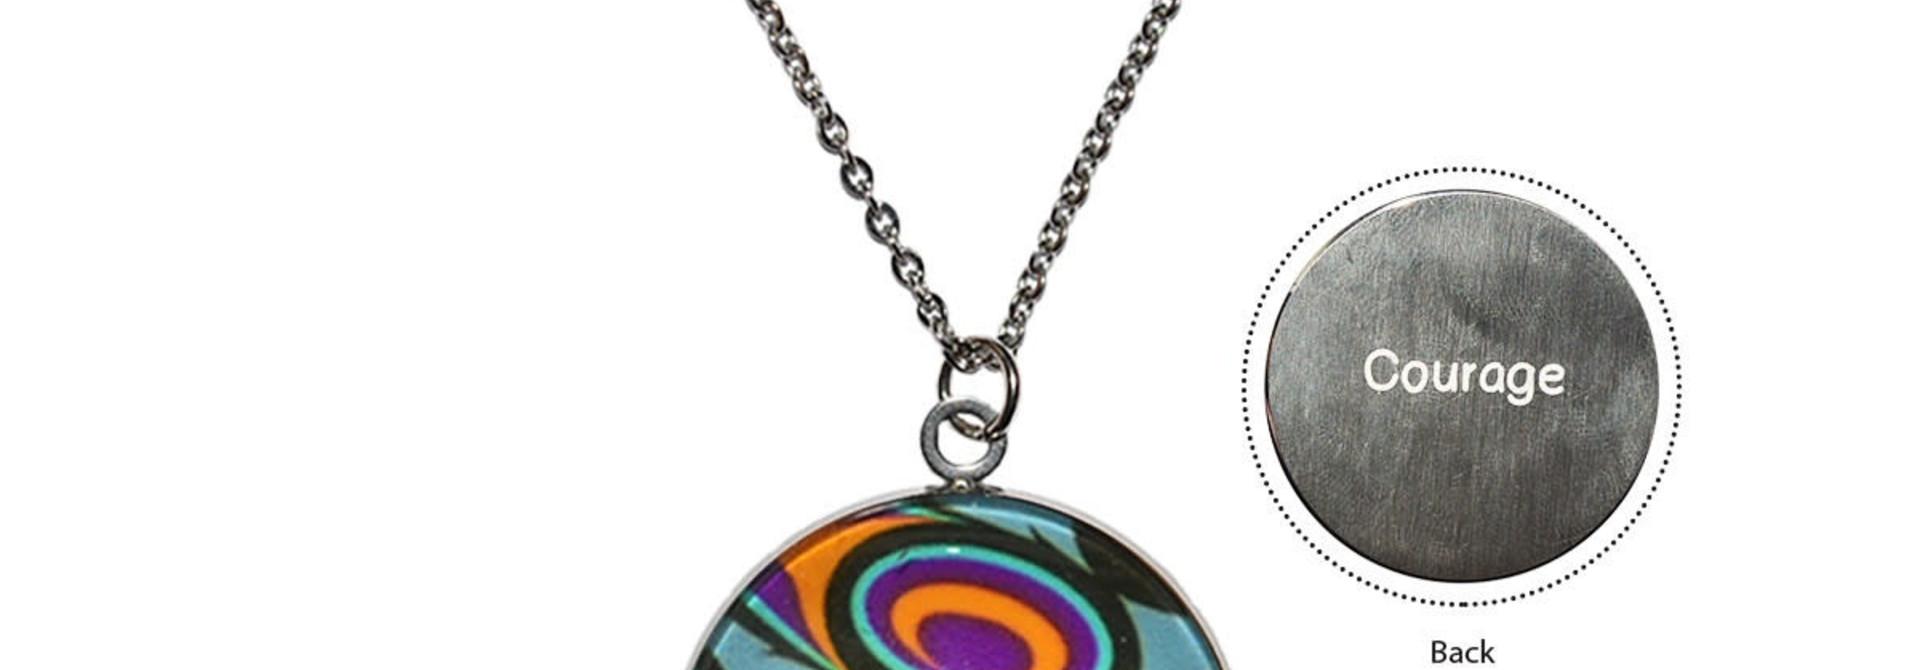 Urban Wolf Charm Necklace by Maynard Johnny